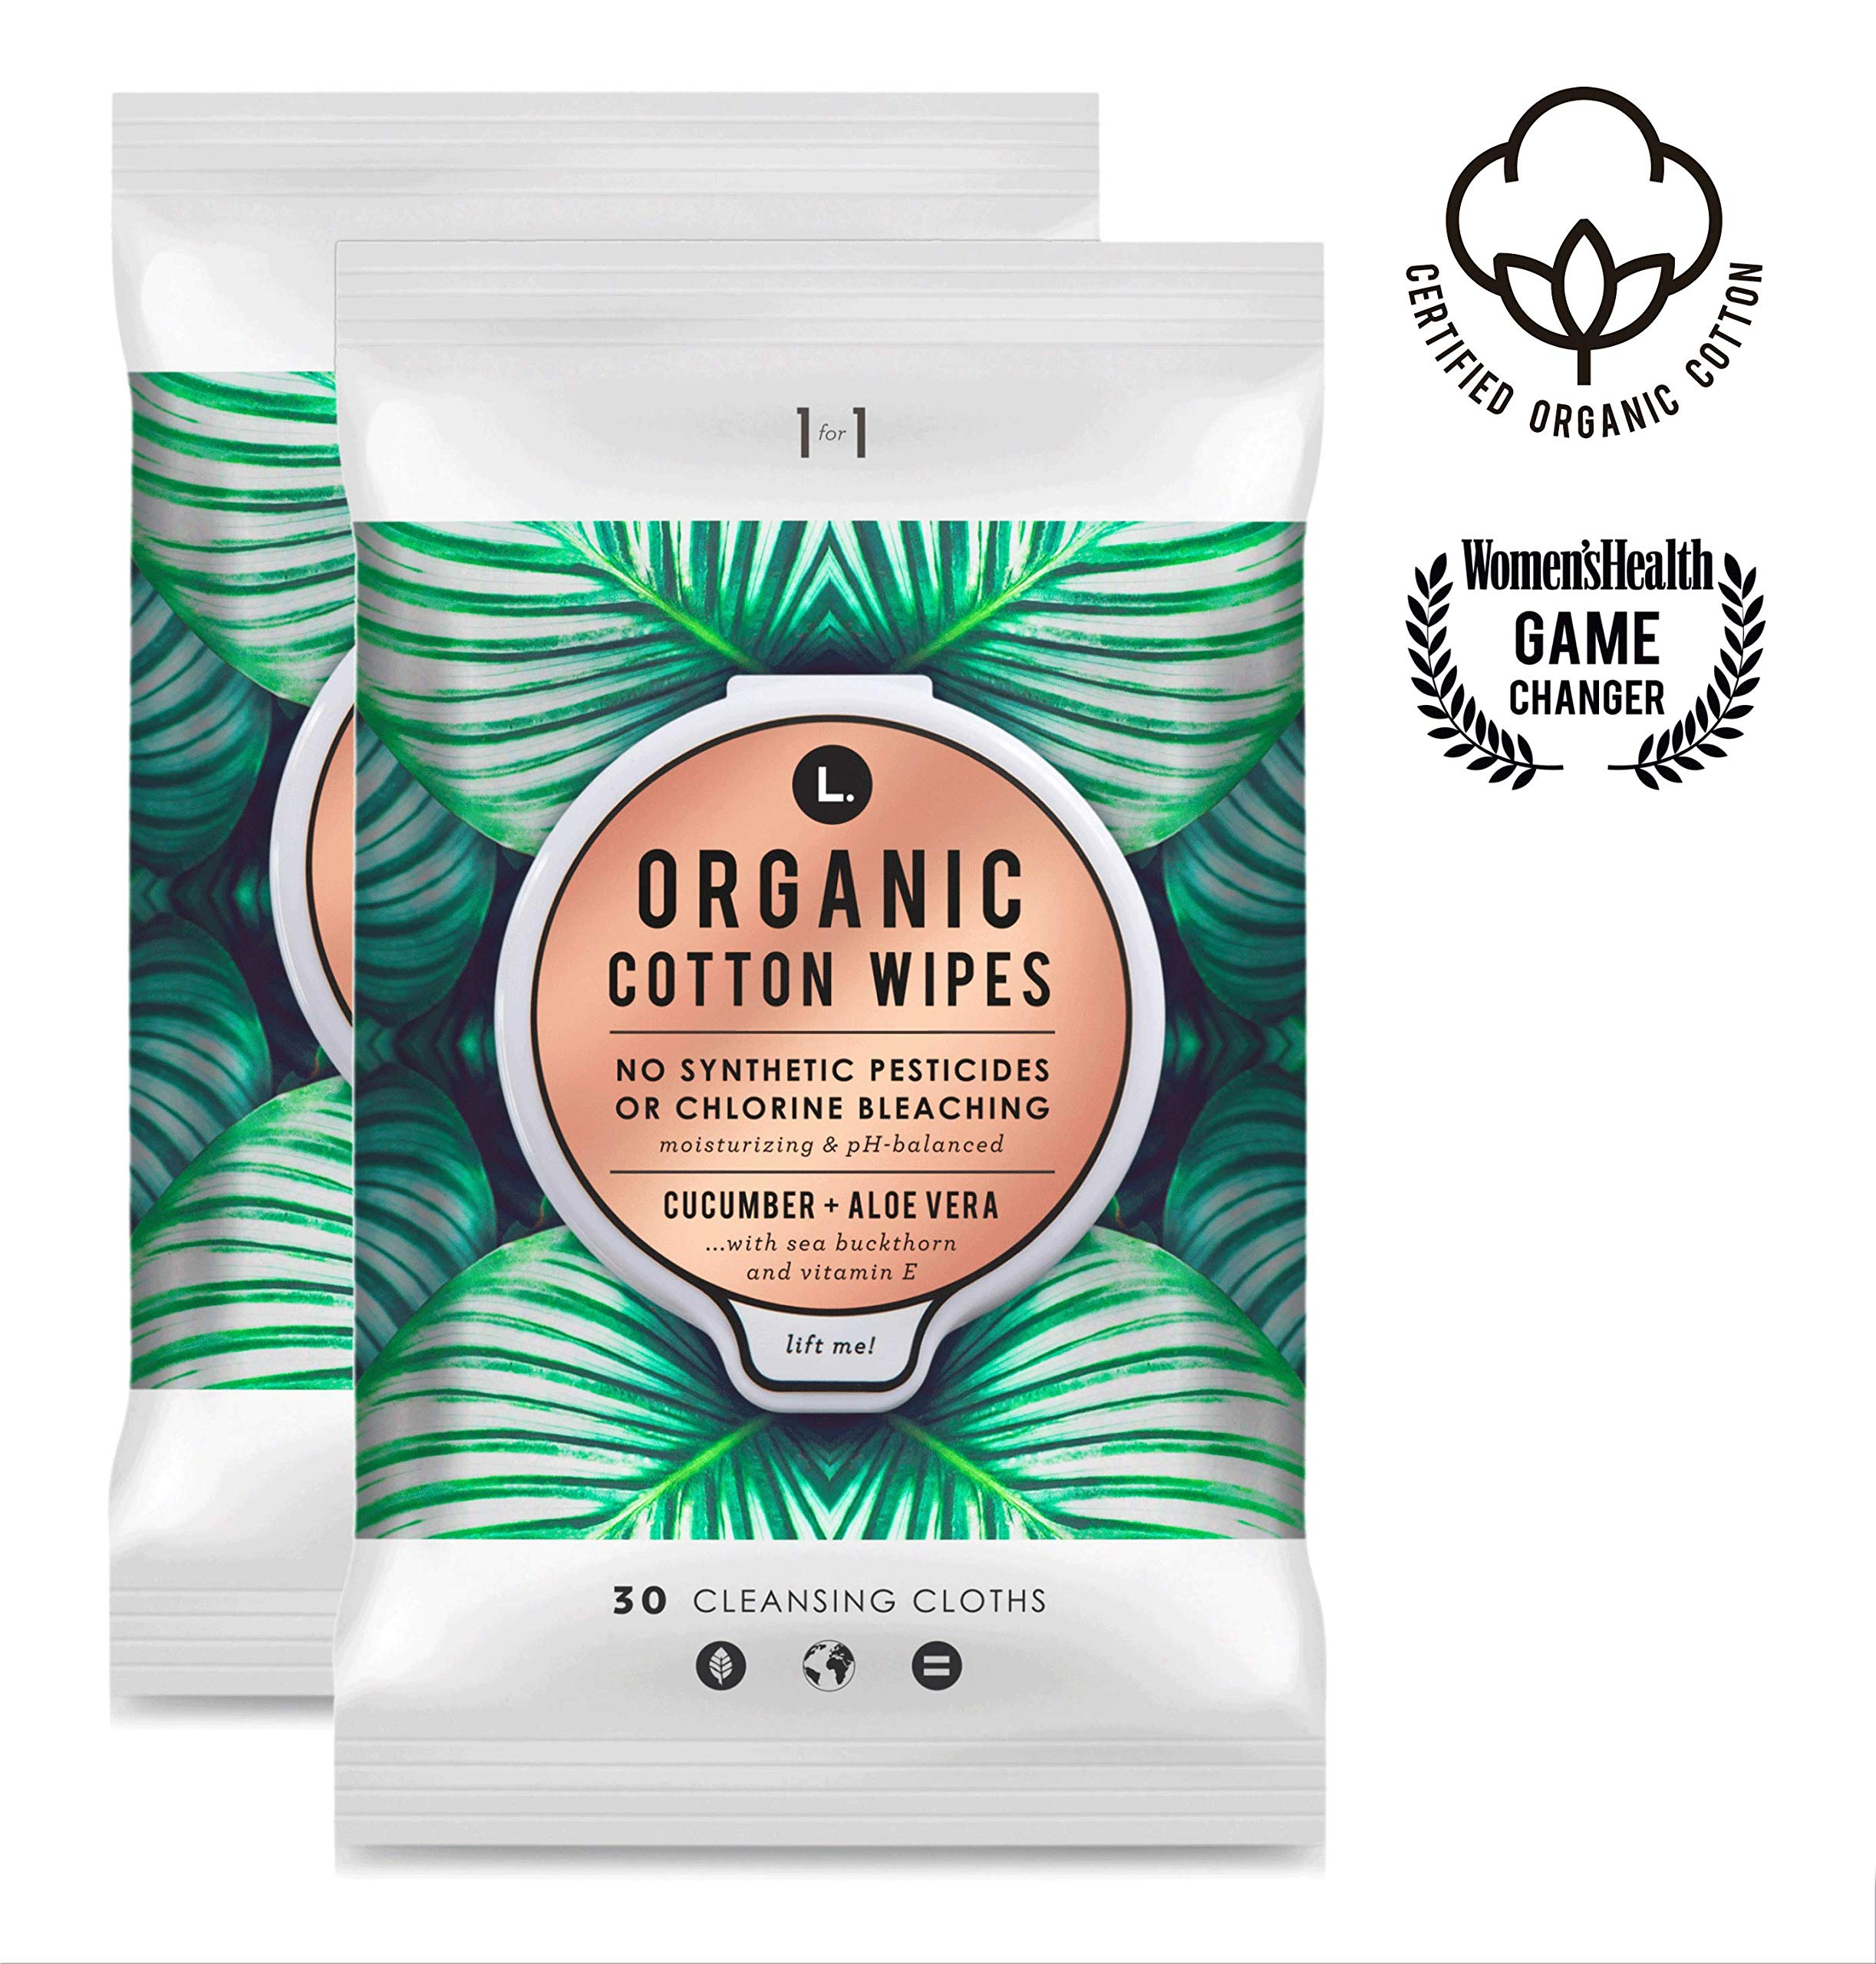 d23b7f8de1b L. Organic Cotton Feminine Wipes with Cucumber + Aloe, Moisturizing &  pH-Balanced, 60 Count